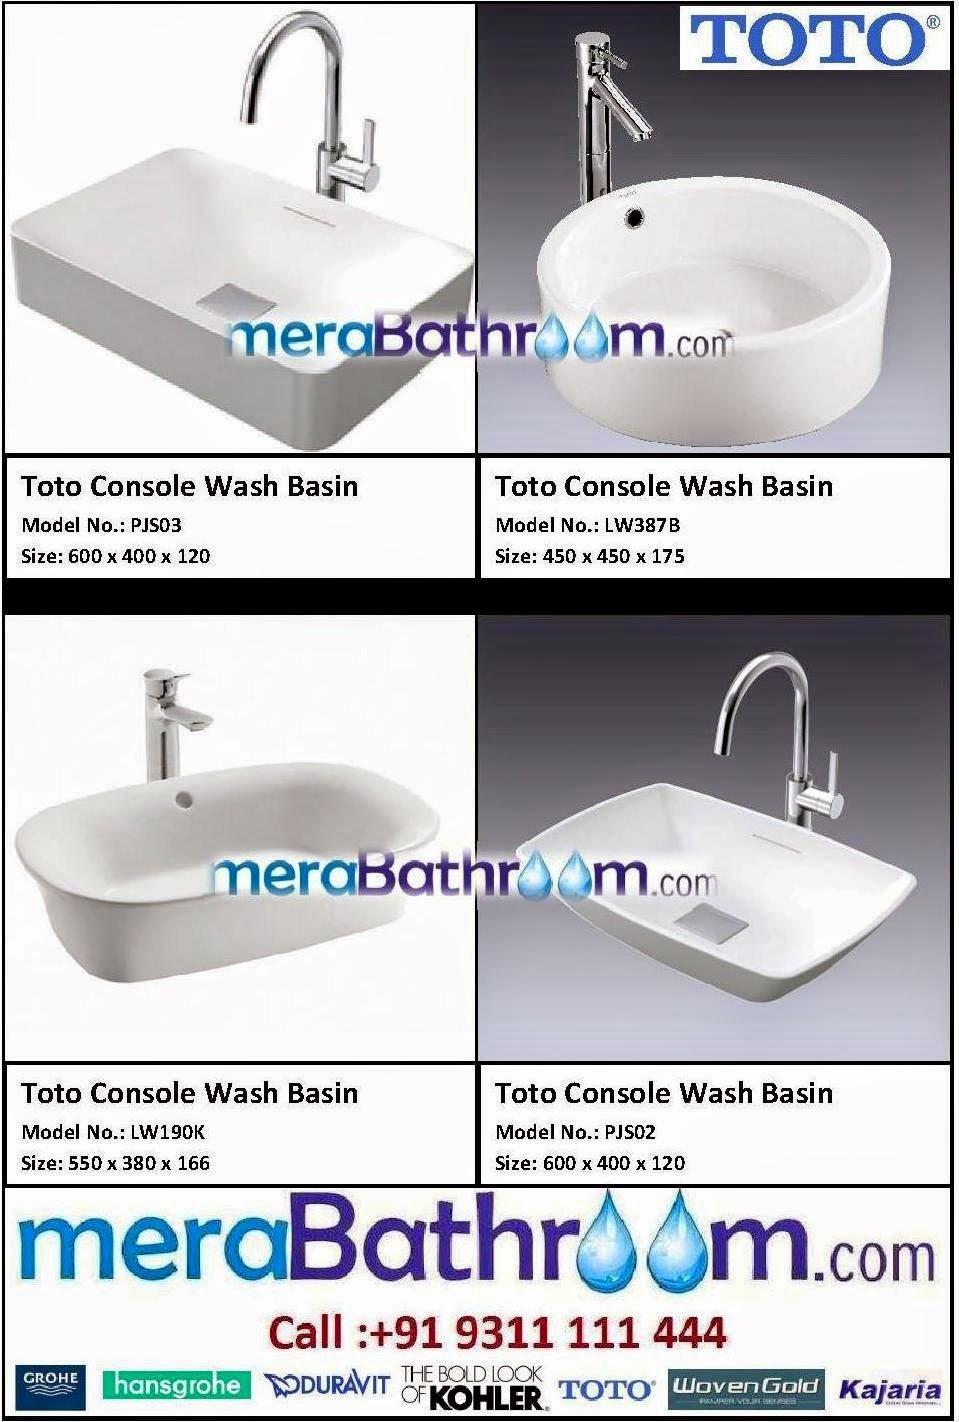 DURAVIT: Toto Console Wash Basins